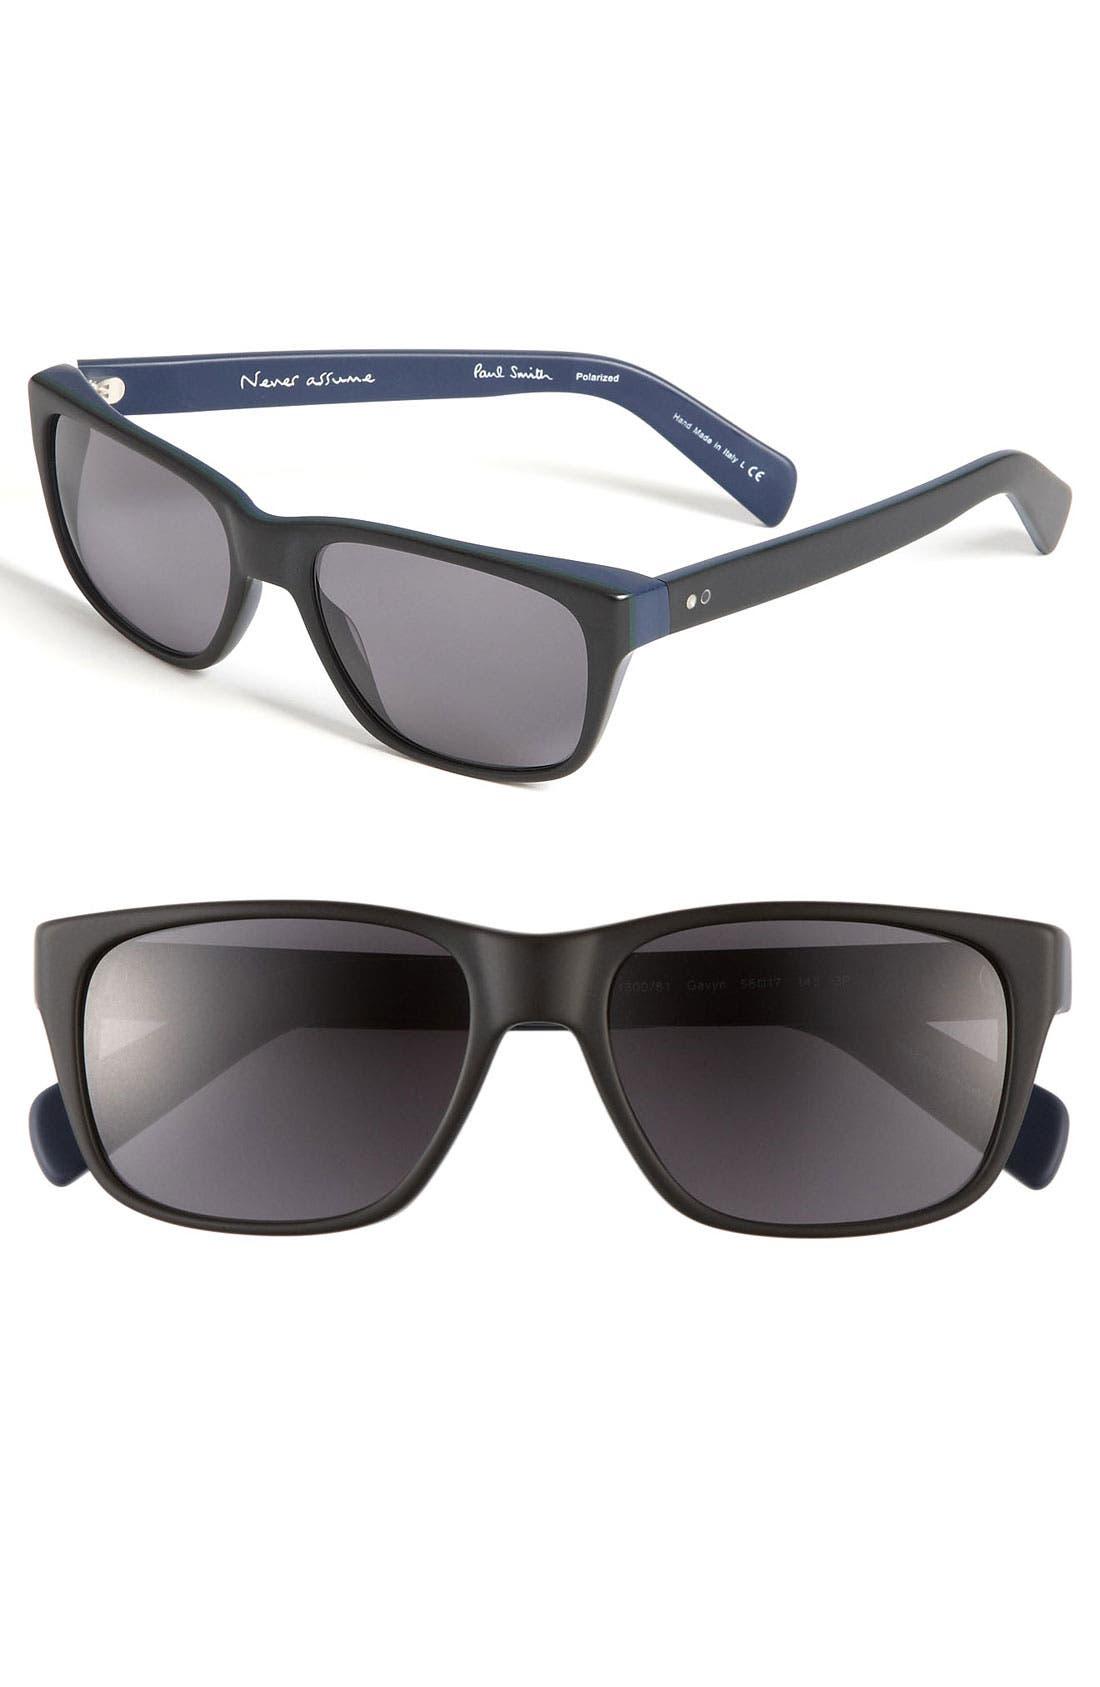 Main Image - Paul Smith 'Gavyn' Polarized Sunglasses